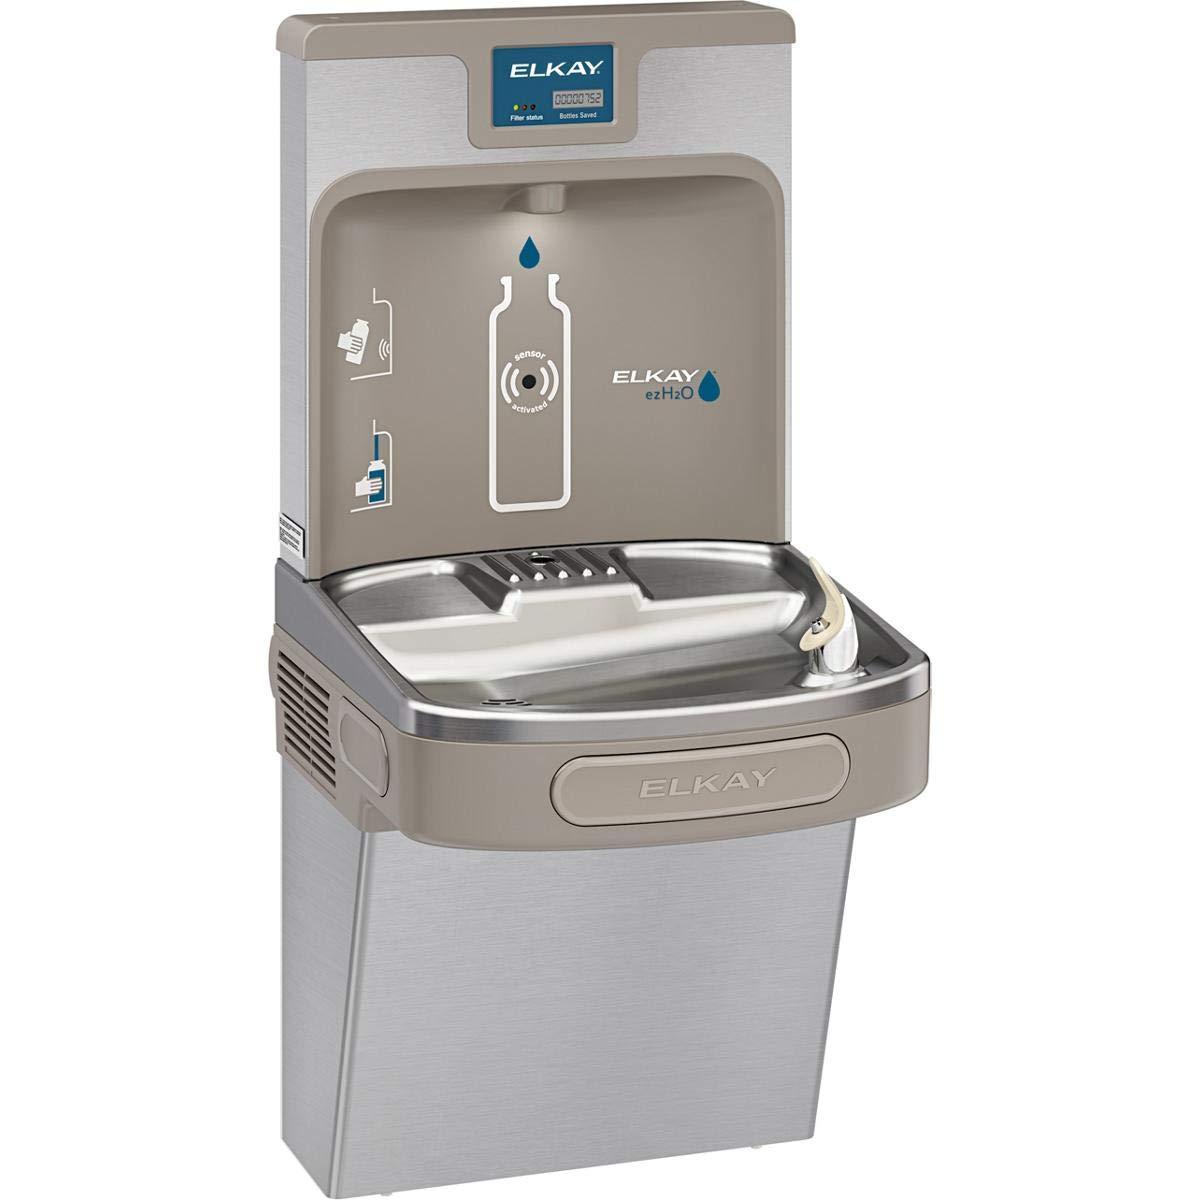 Elkay LZS8WSSP Enhanced EZH2O Bottle Filling Station & Single ADA Cooler, Filtered 8 GPH Stainless